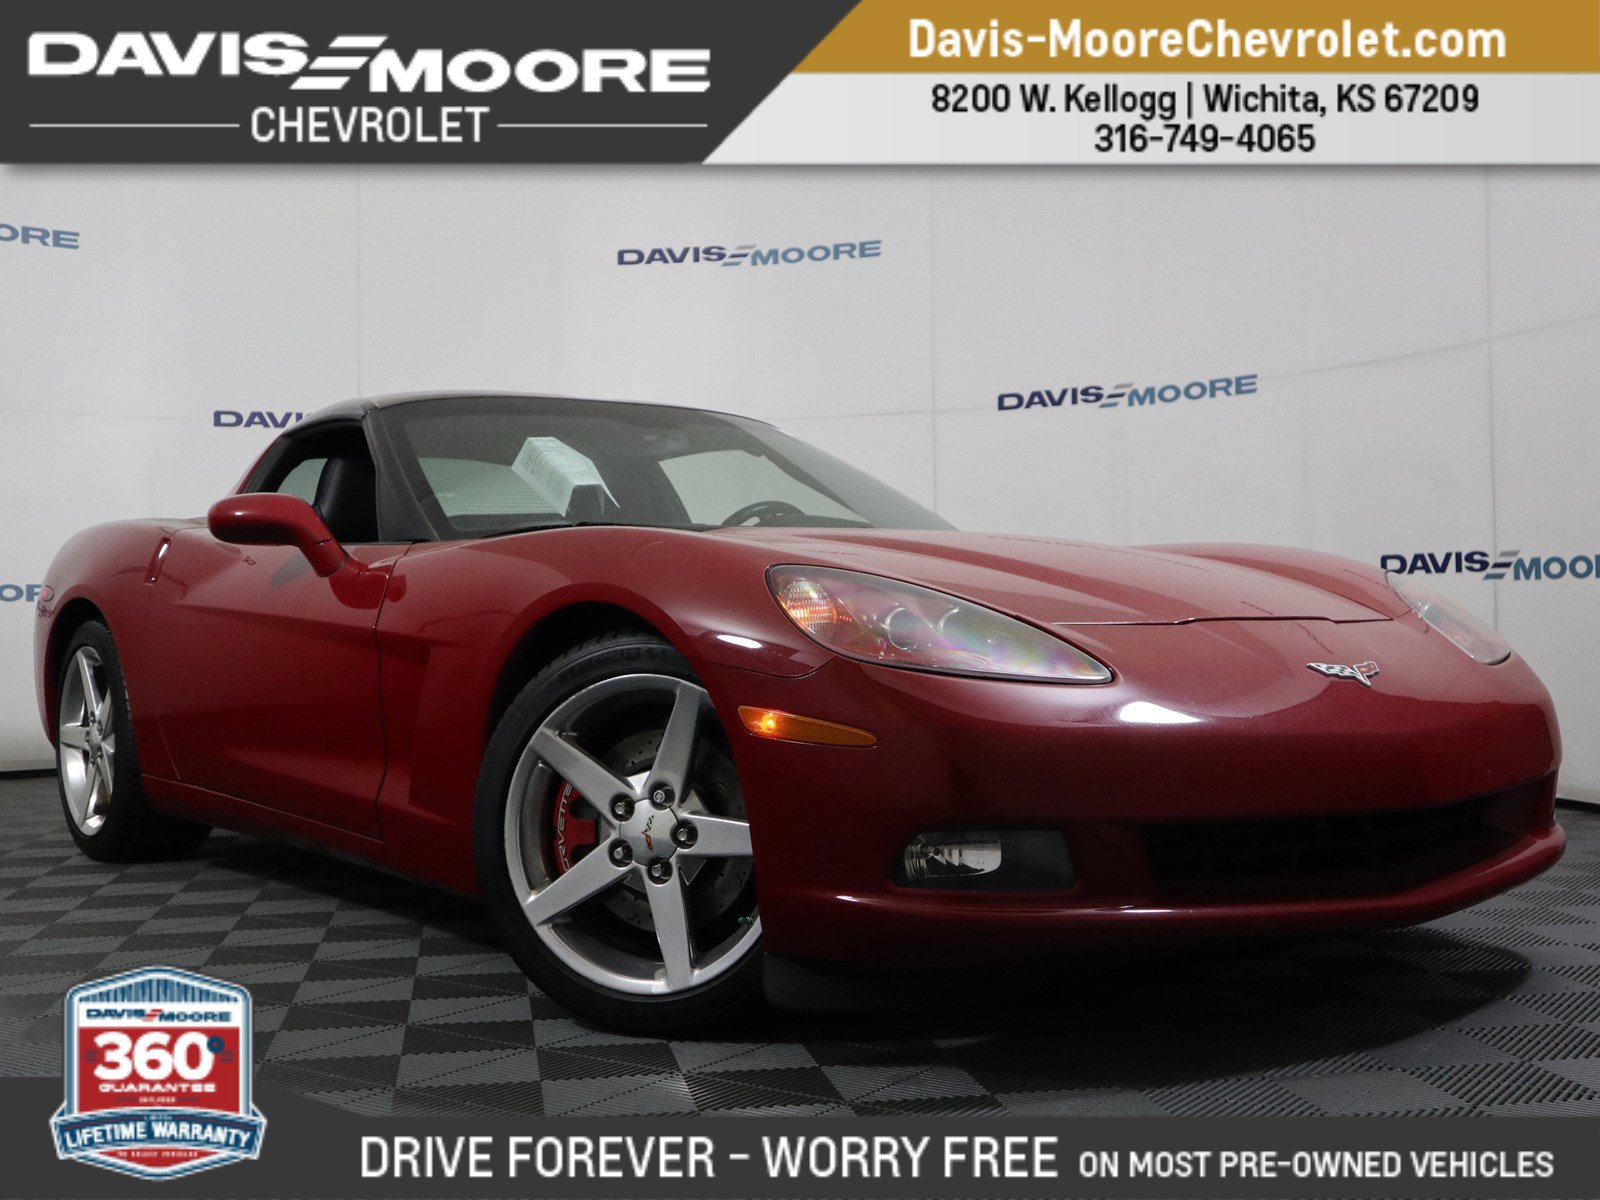 2005 Chevrolet Corvette Coupe image